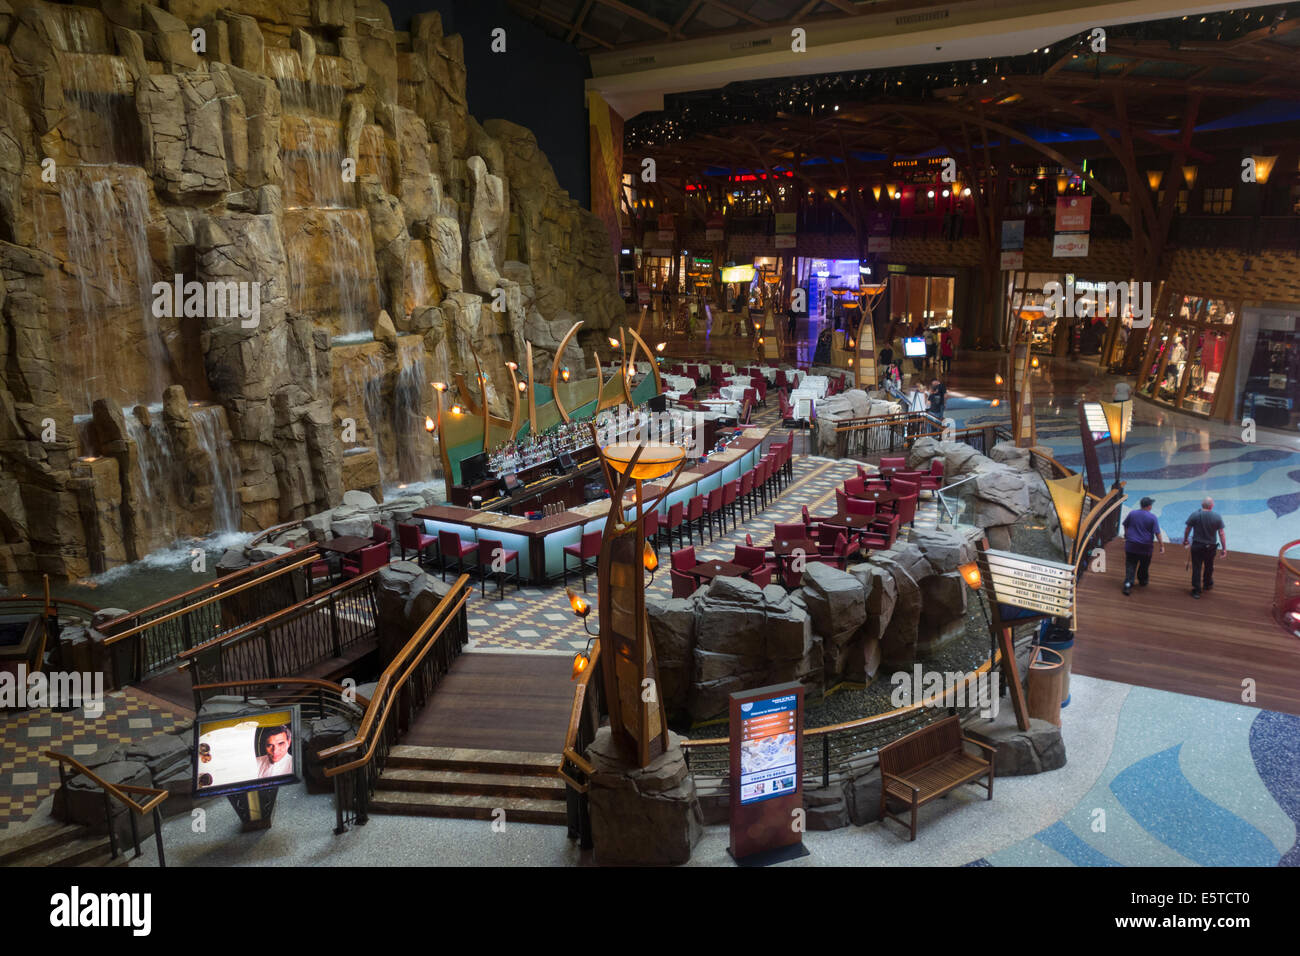 Mohegan sun casino address uncasville ct